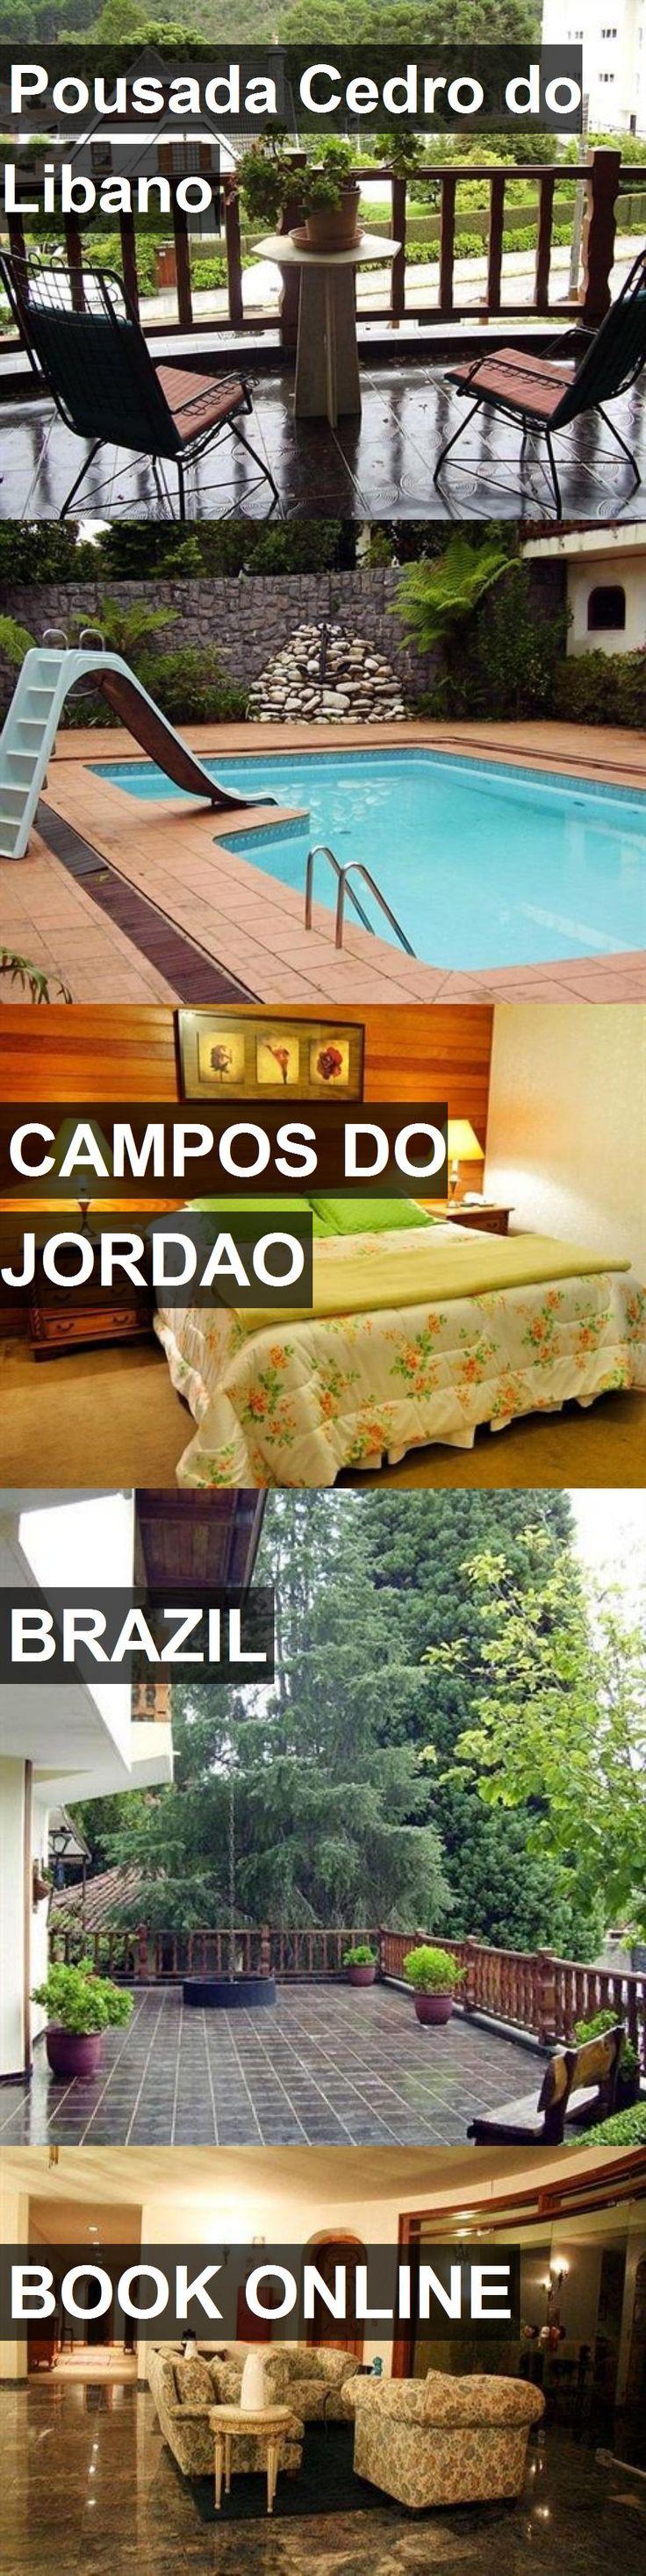 Hotel Pousada Cedro do Libano in Campos do Jordao, Brazil. For more information, photos, reviews and best prices please follow the link. #Brazil #CamposdoJordao #travel #vacation #hotel